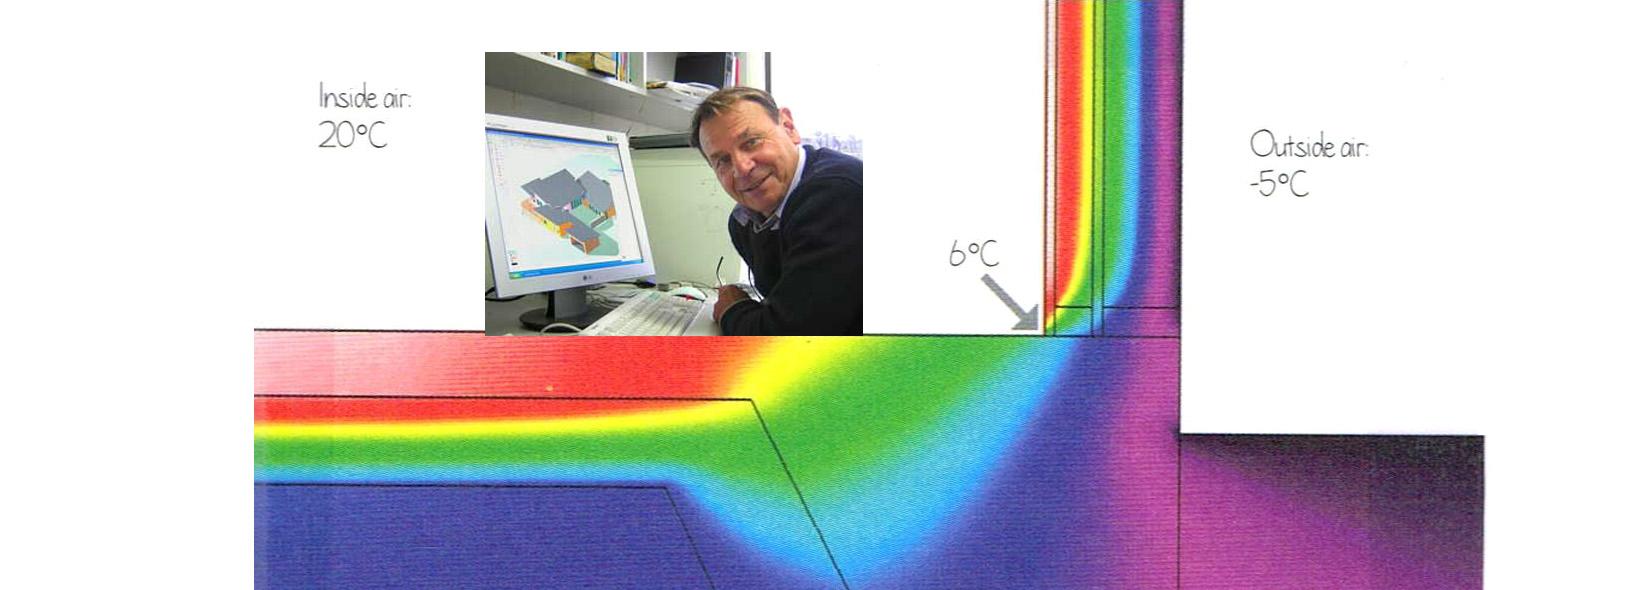 Air tightness and thermal bridging in buildings